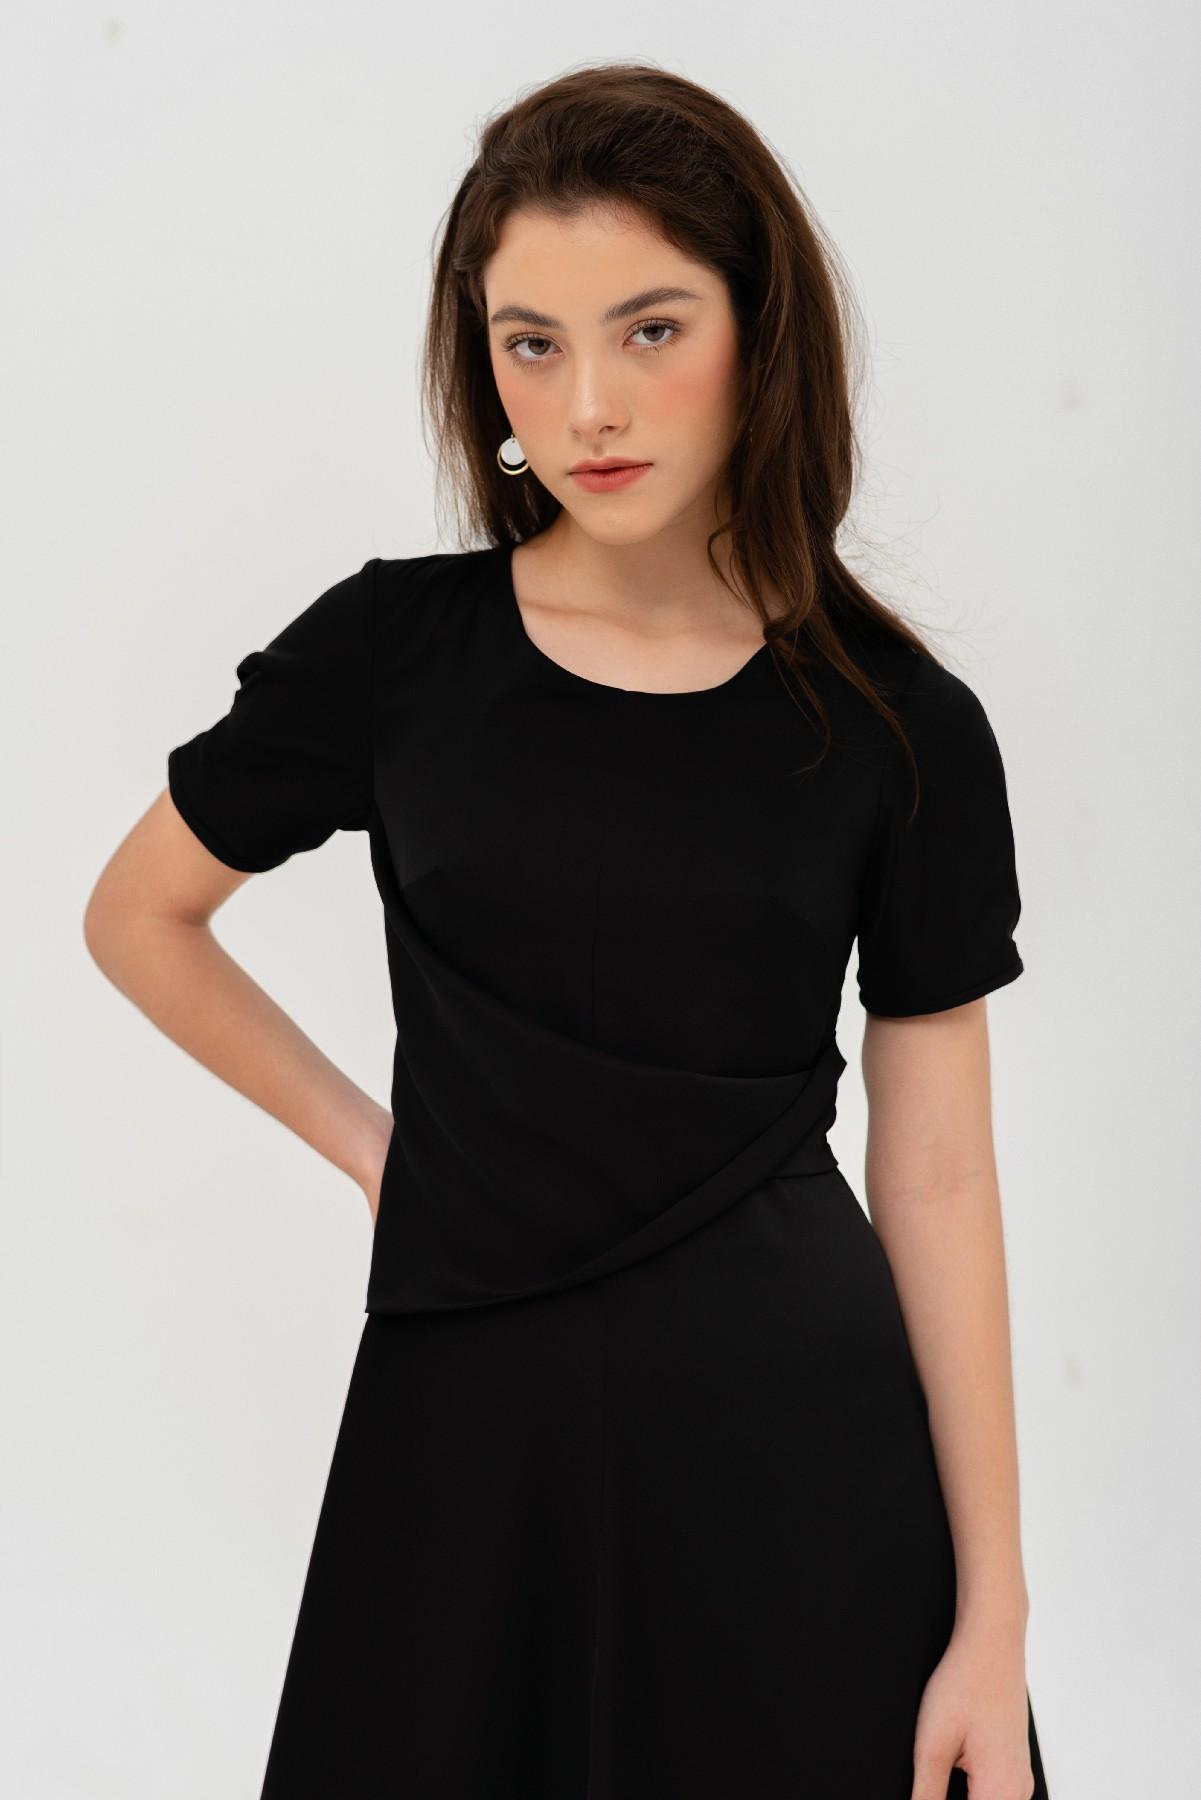 Đầm đen xoắn eo tay ngắn 2